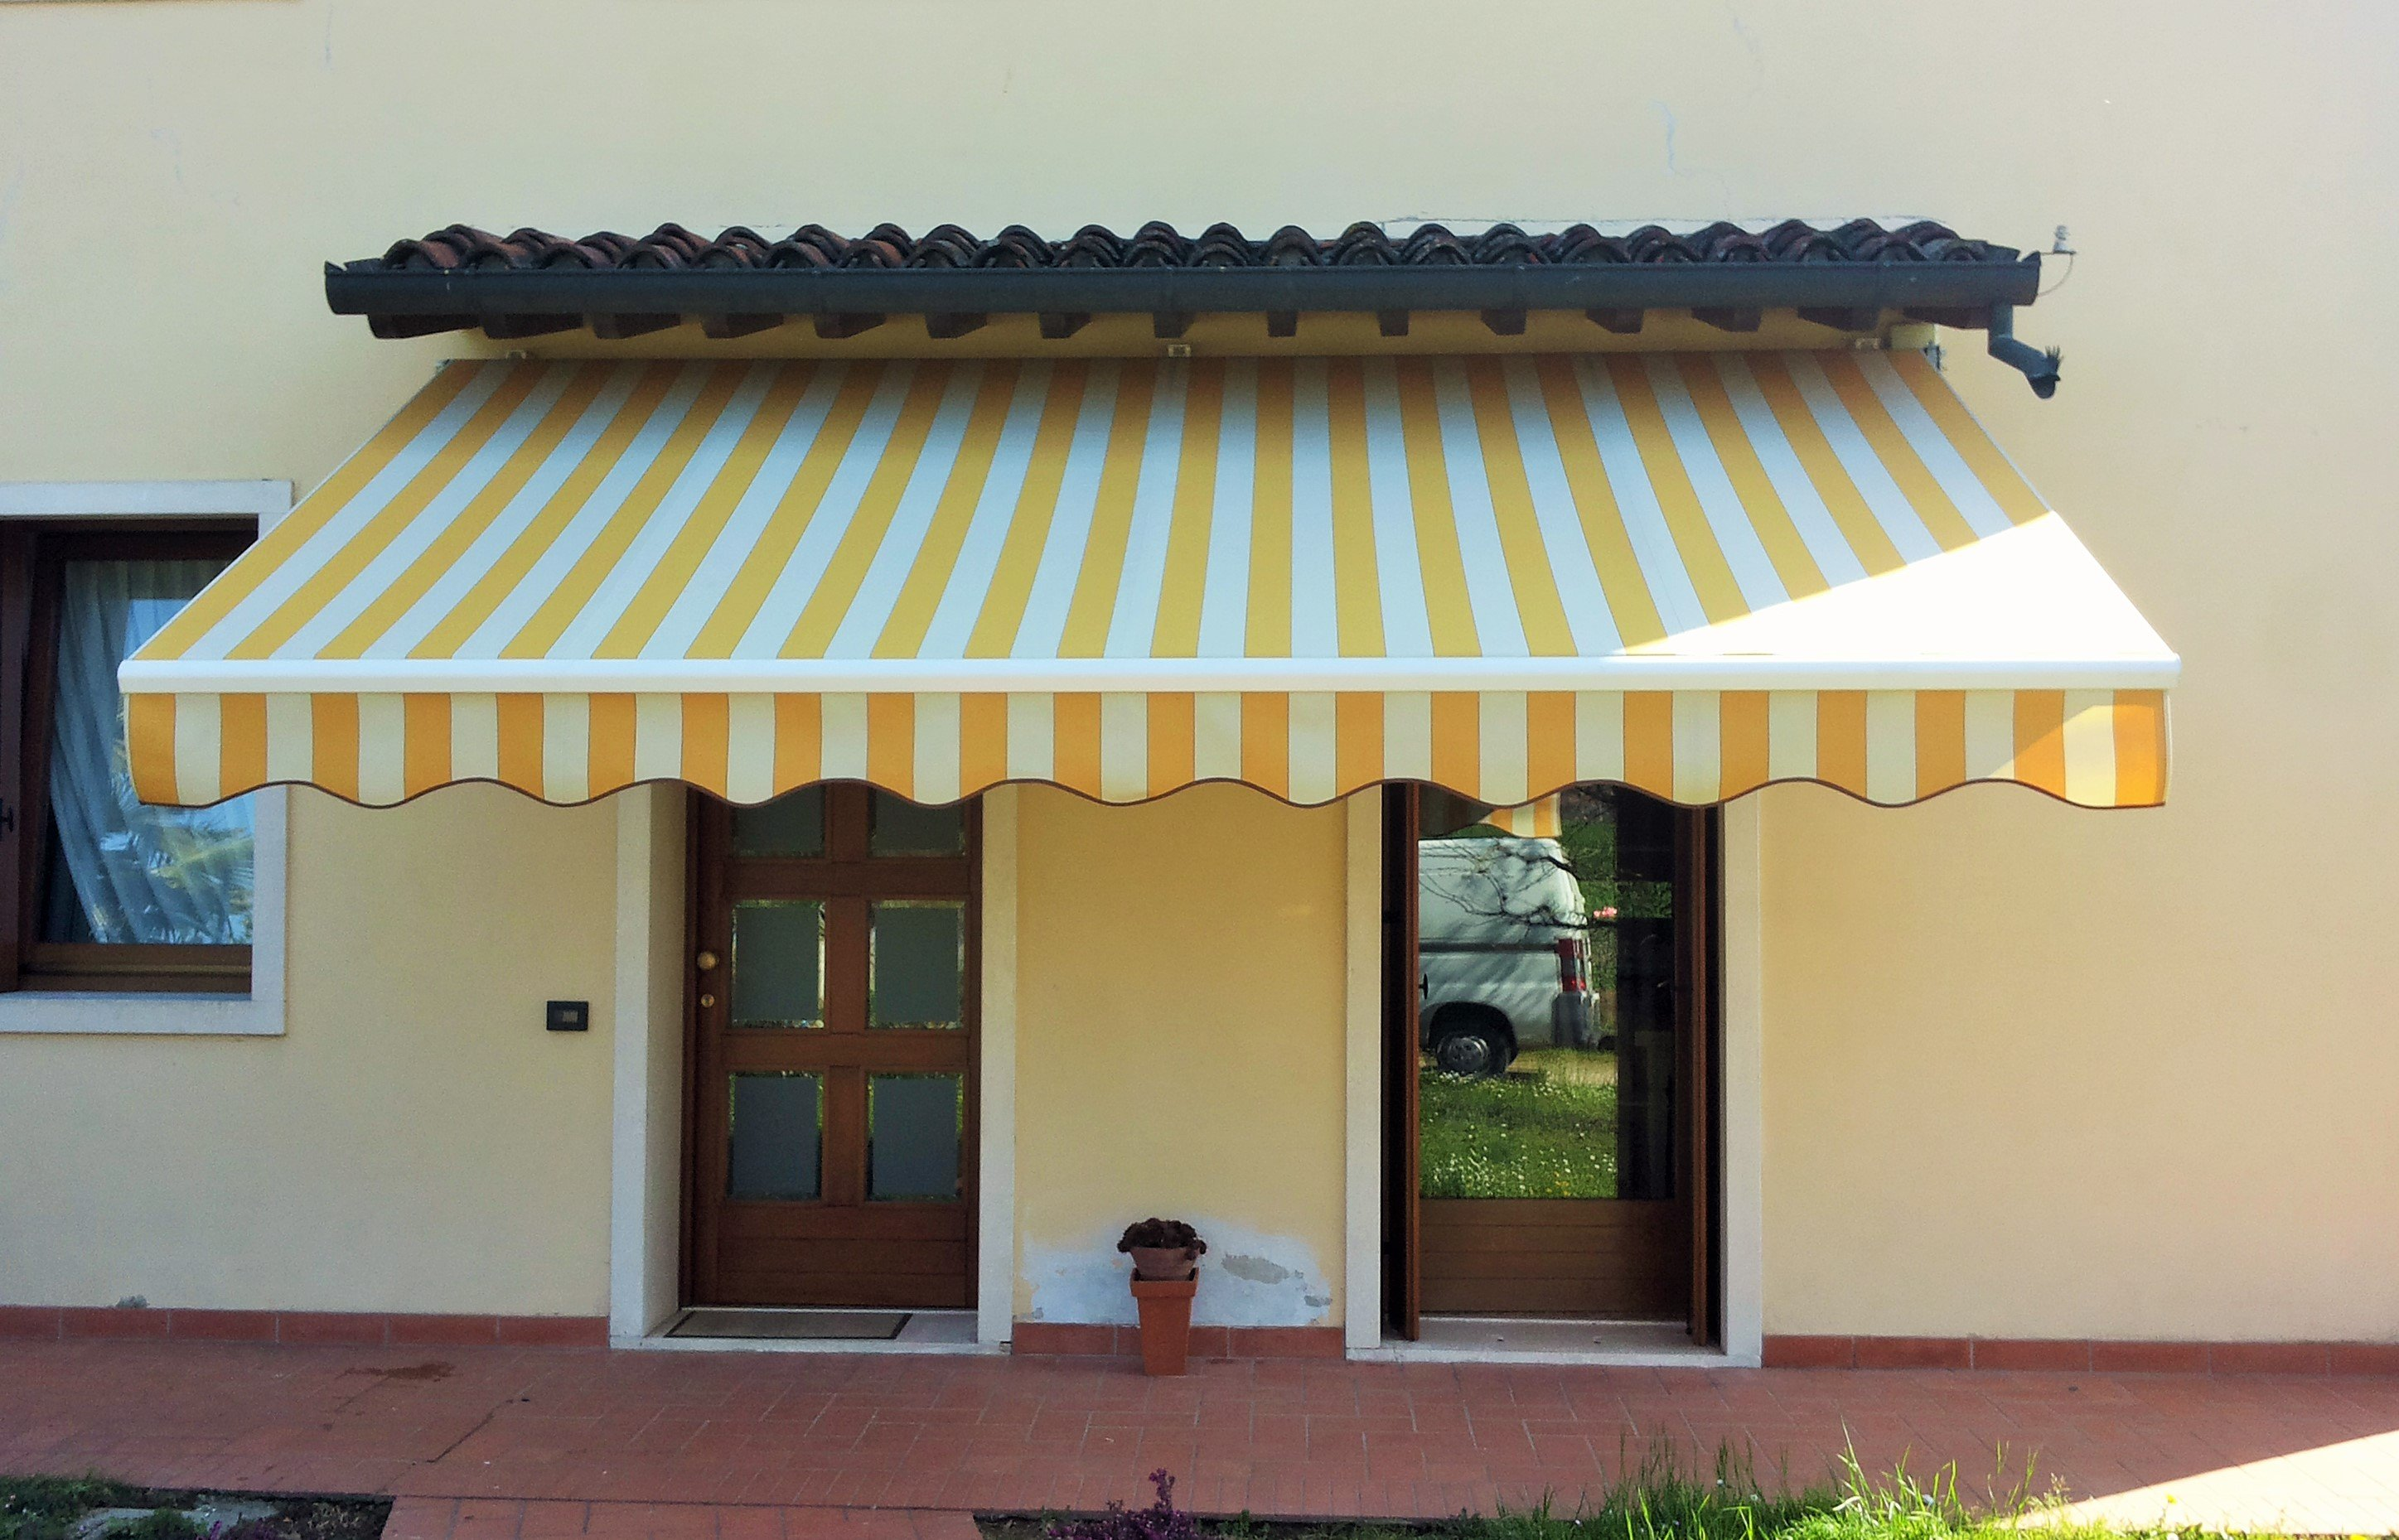 tenda per esterno estendibile gialla e bianca a righe